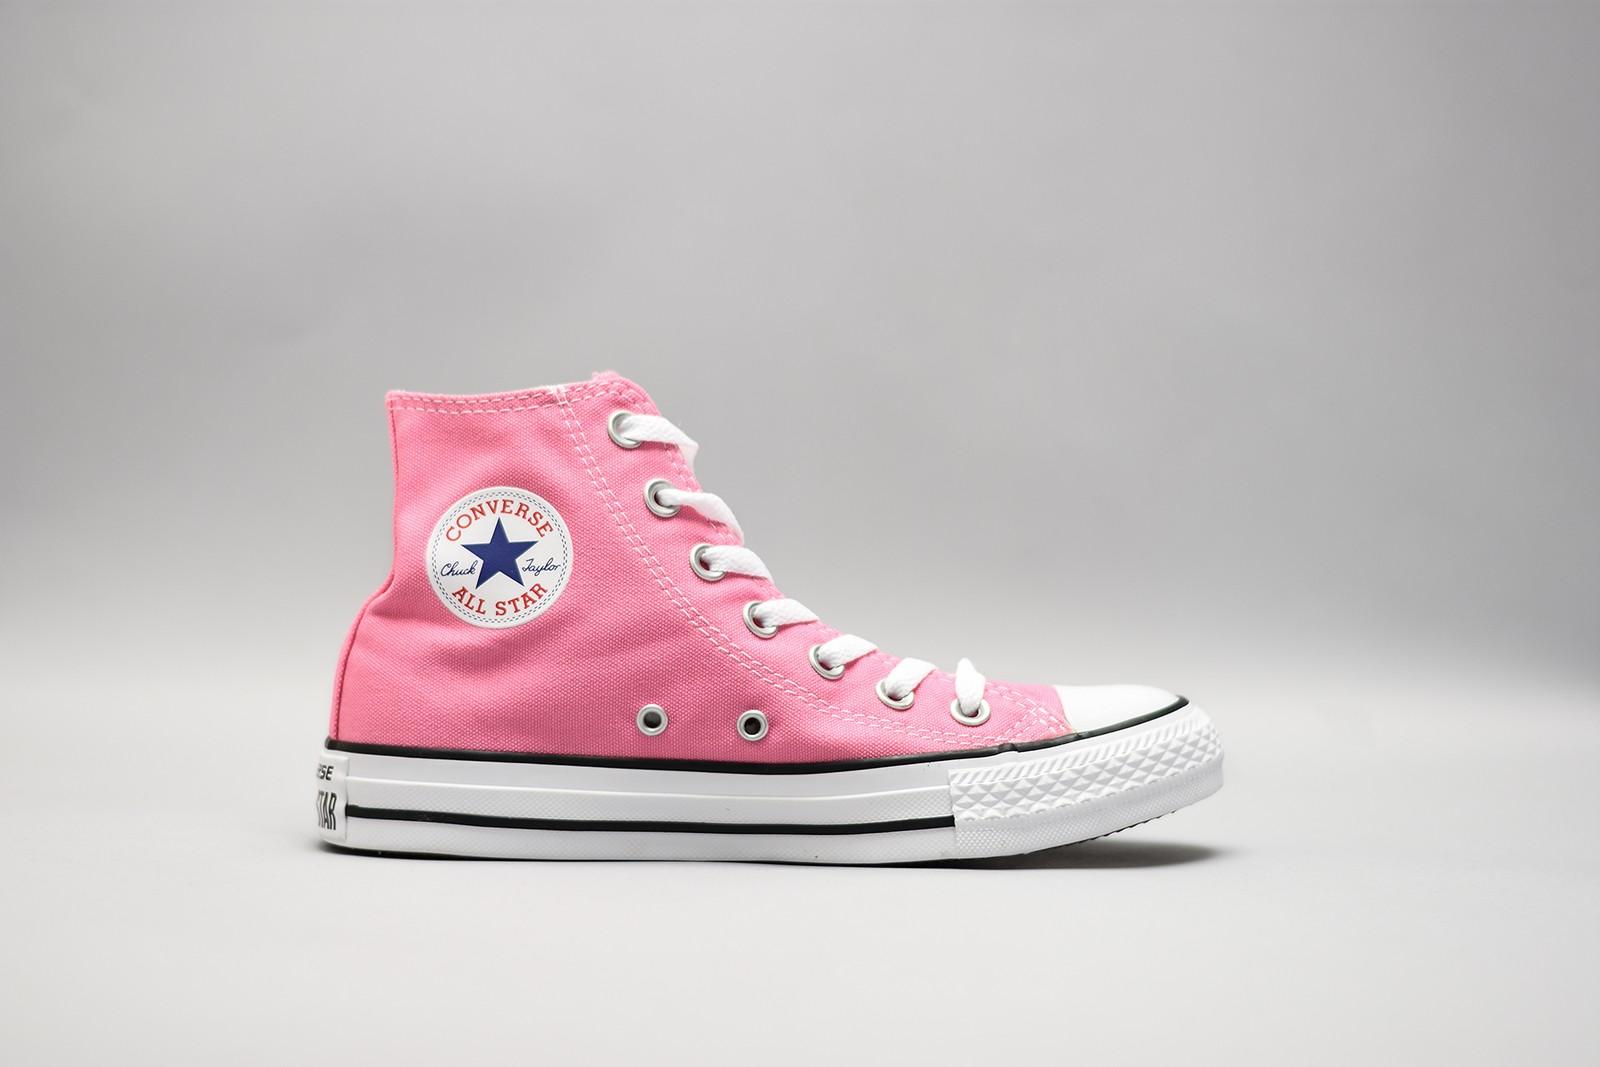 25247856d93f Dámské boty Converse Chuck Taylor All Star růžová